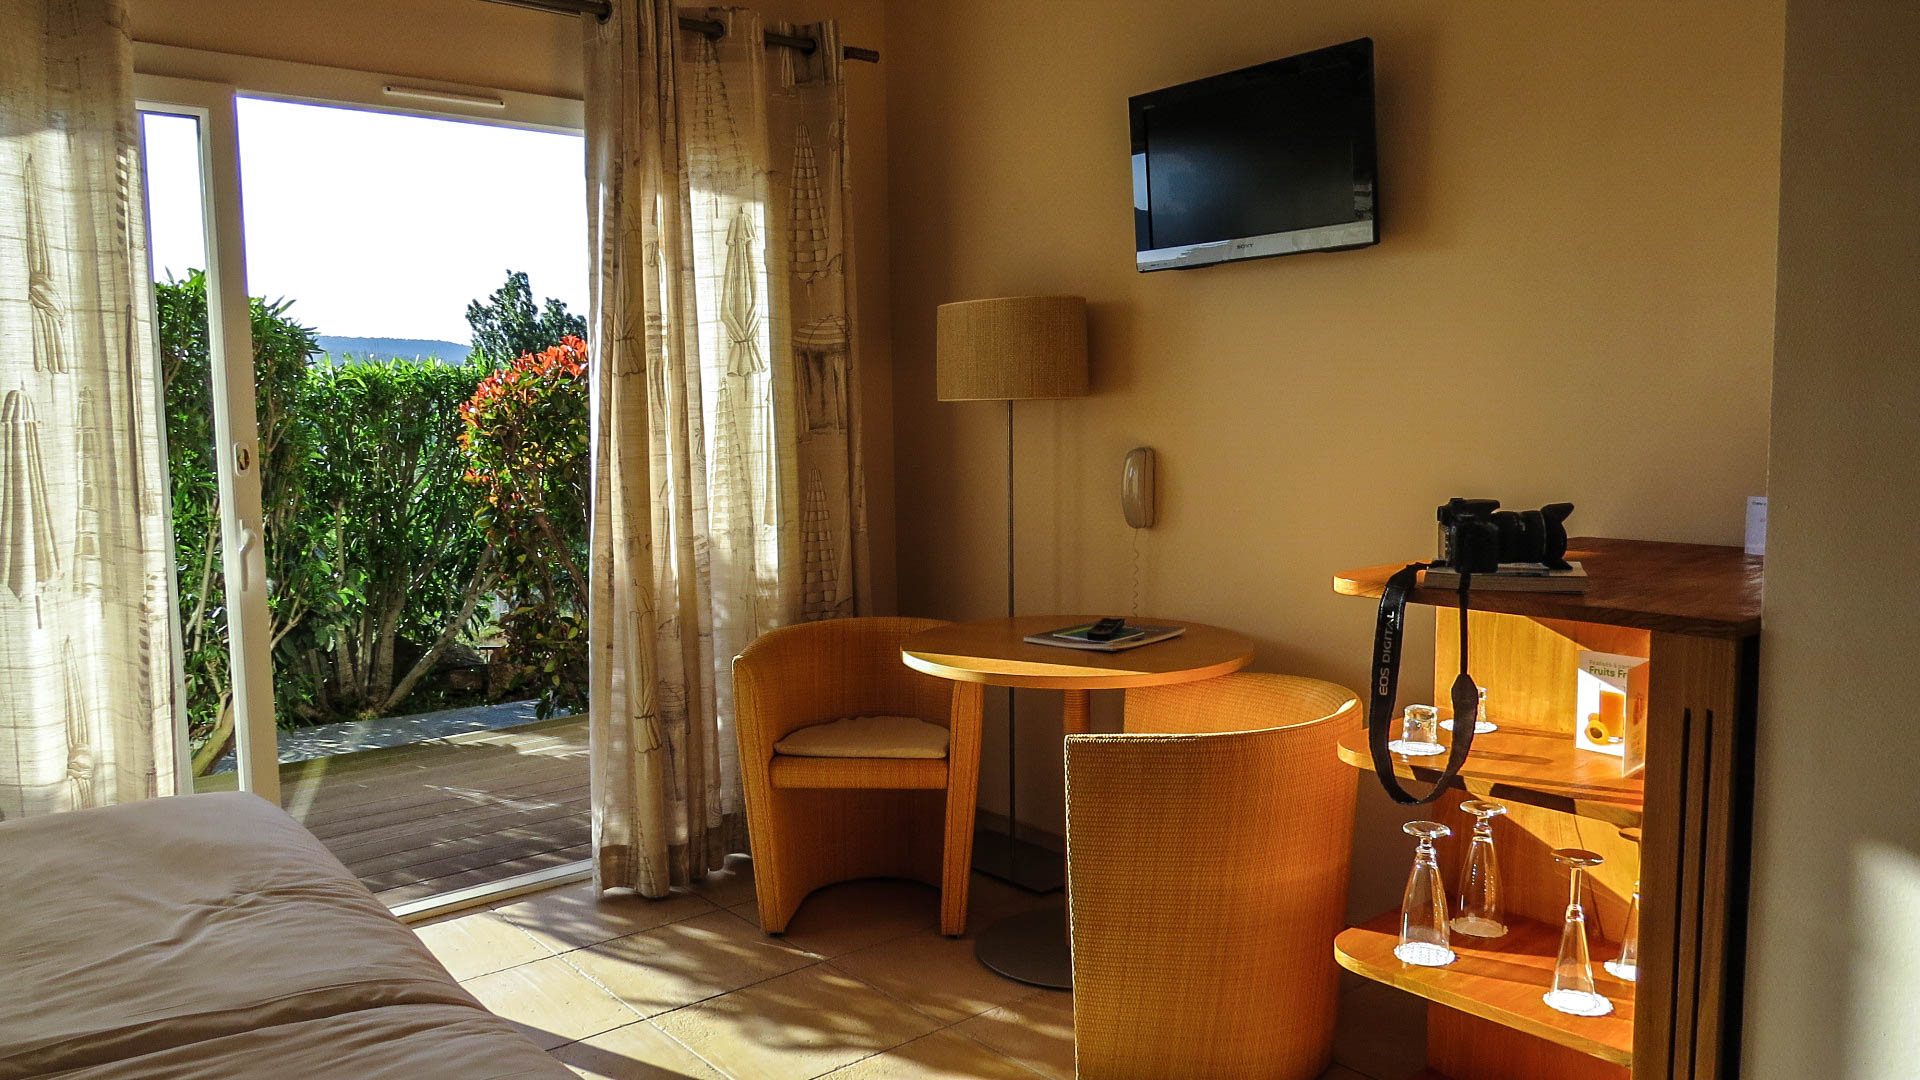 hôtel Alivi di Santa Guilia fauteuil roulant